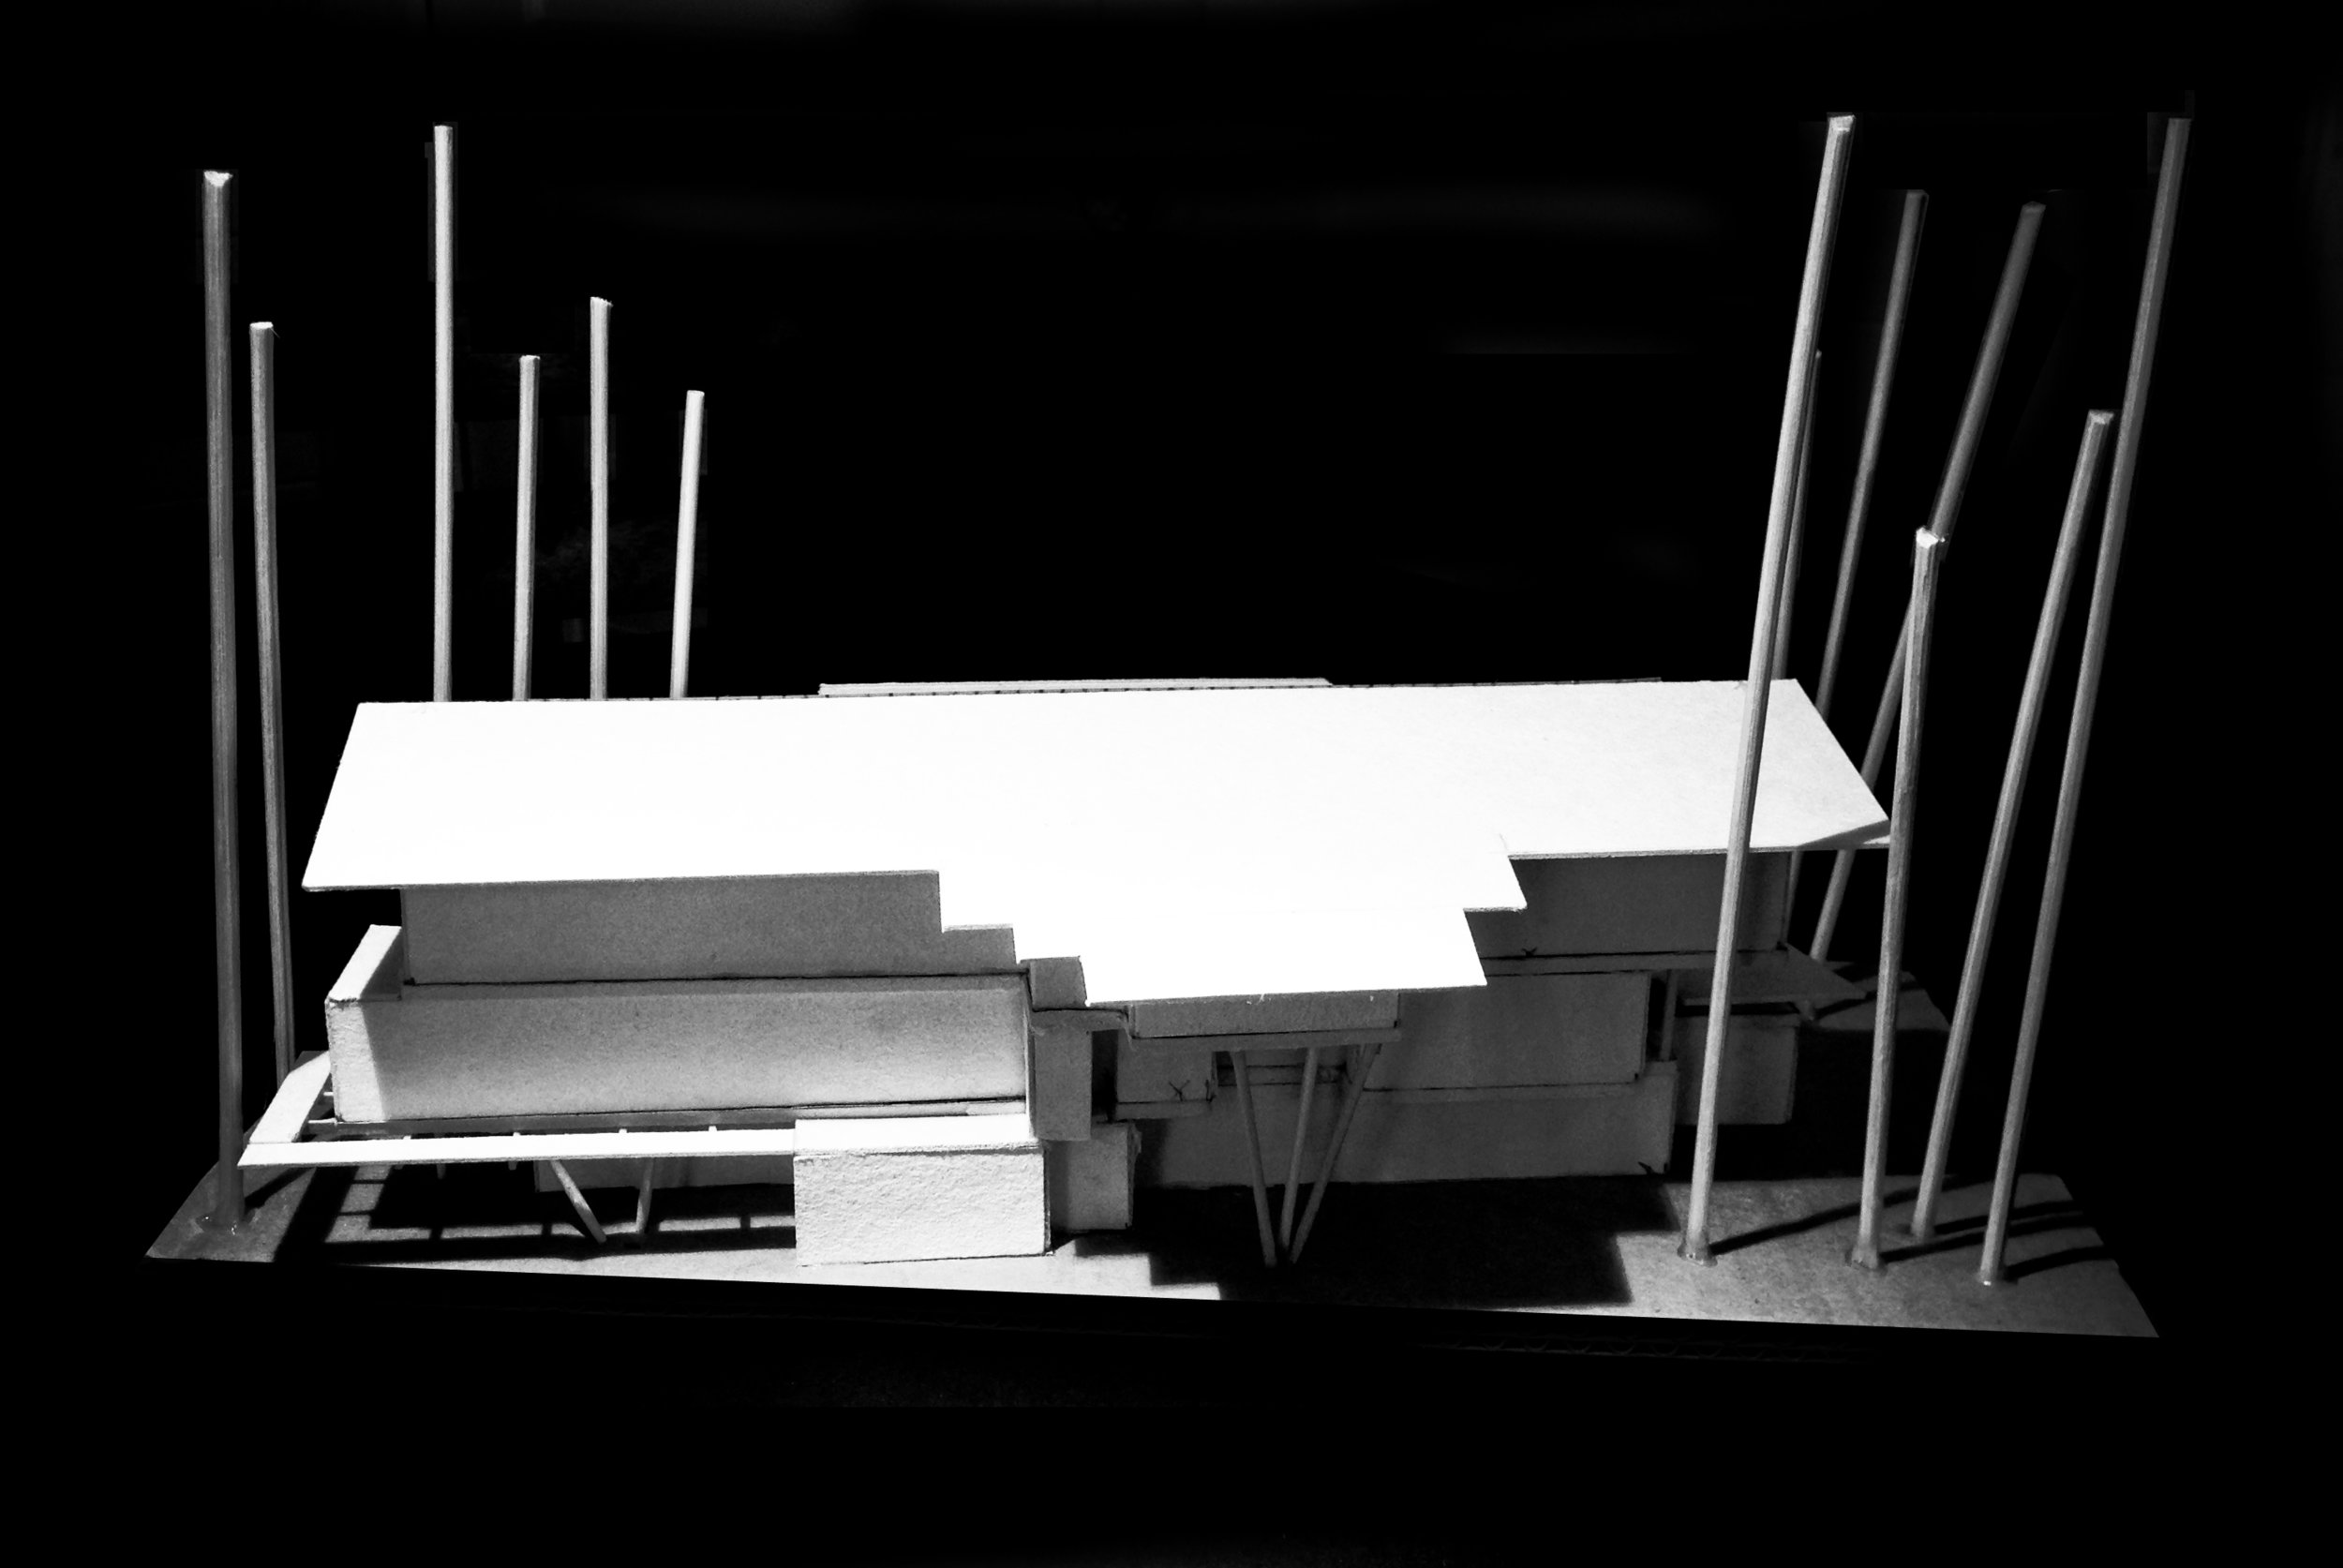 3 Storey Building design model - Parkside View